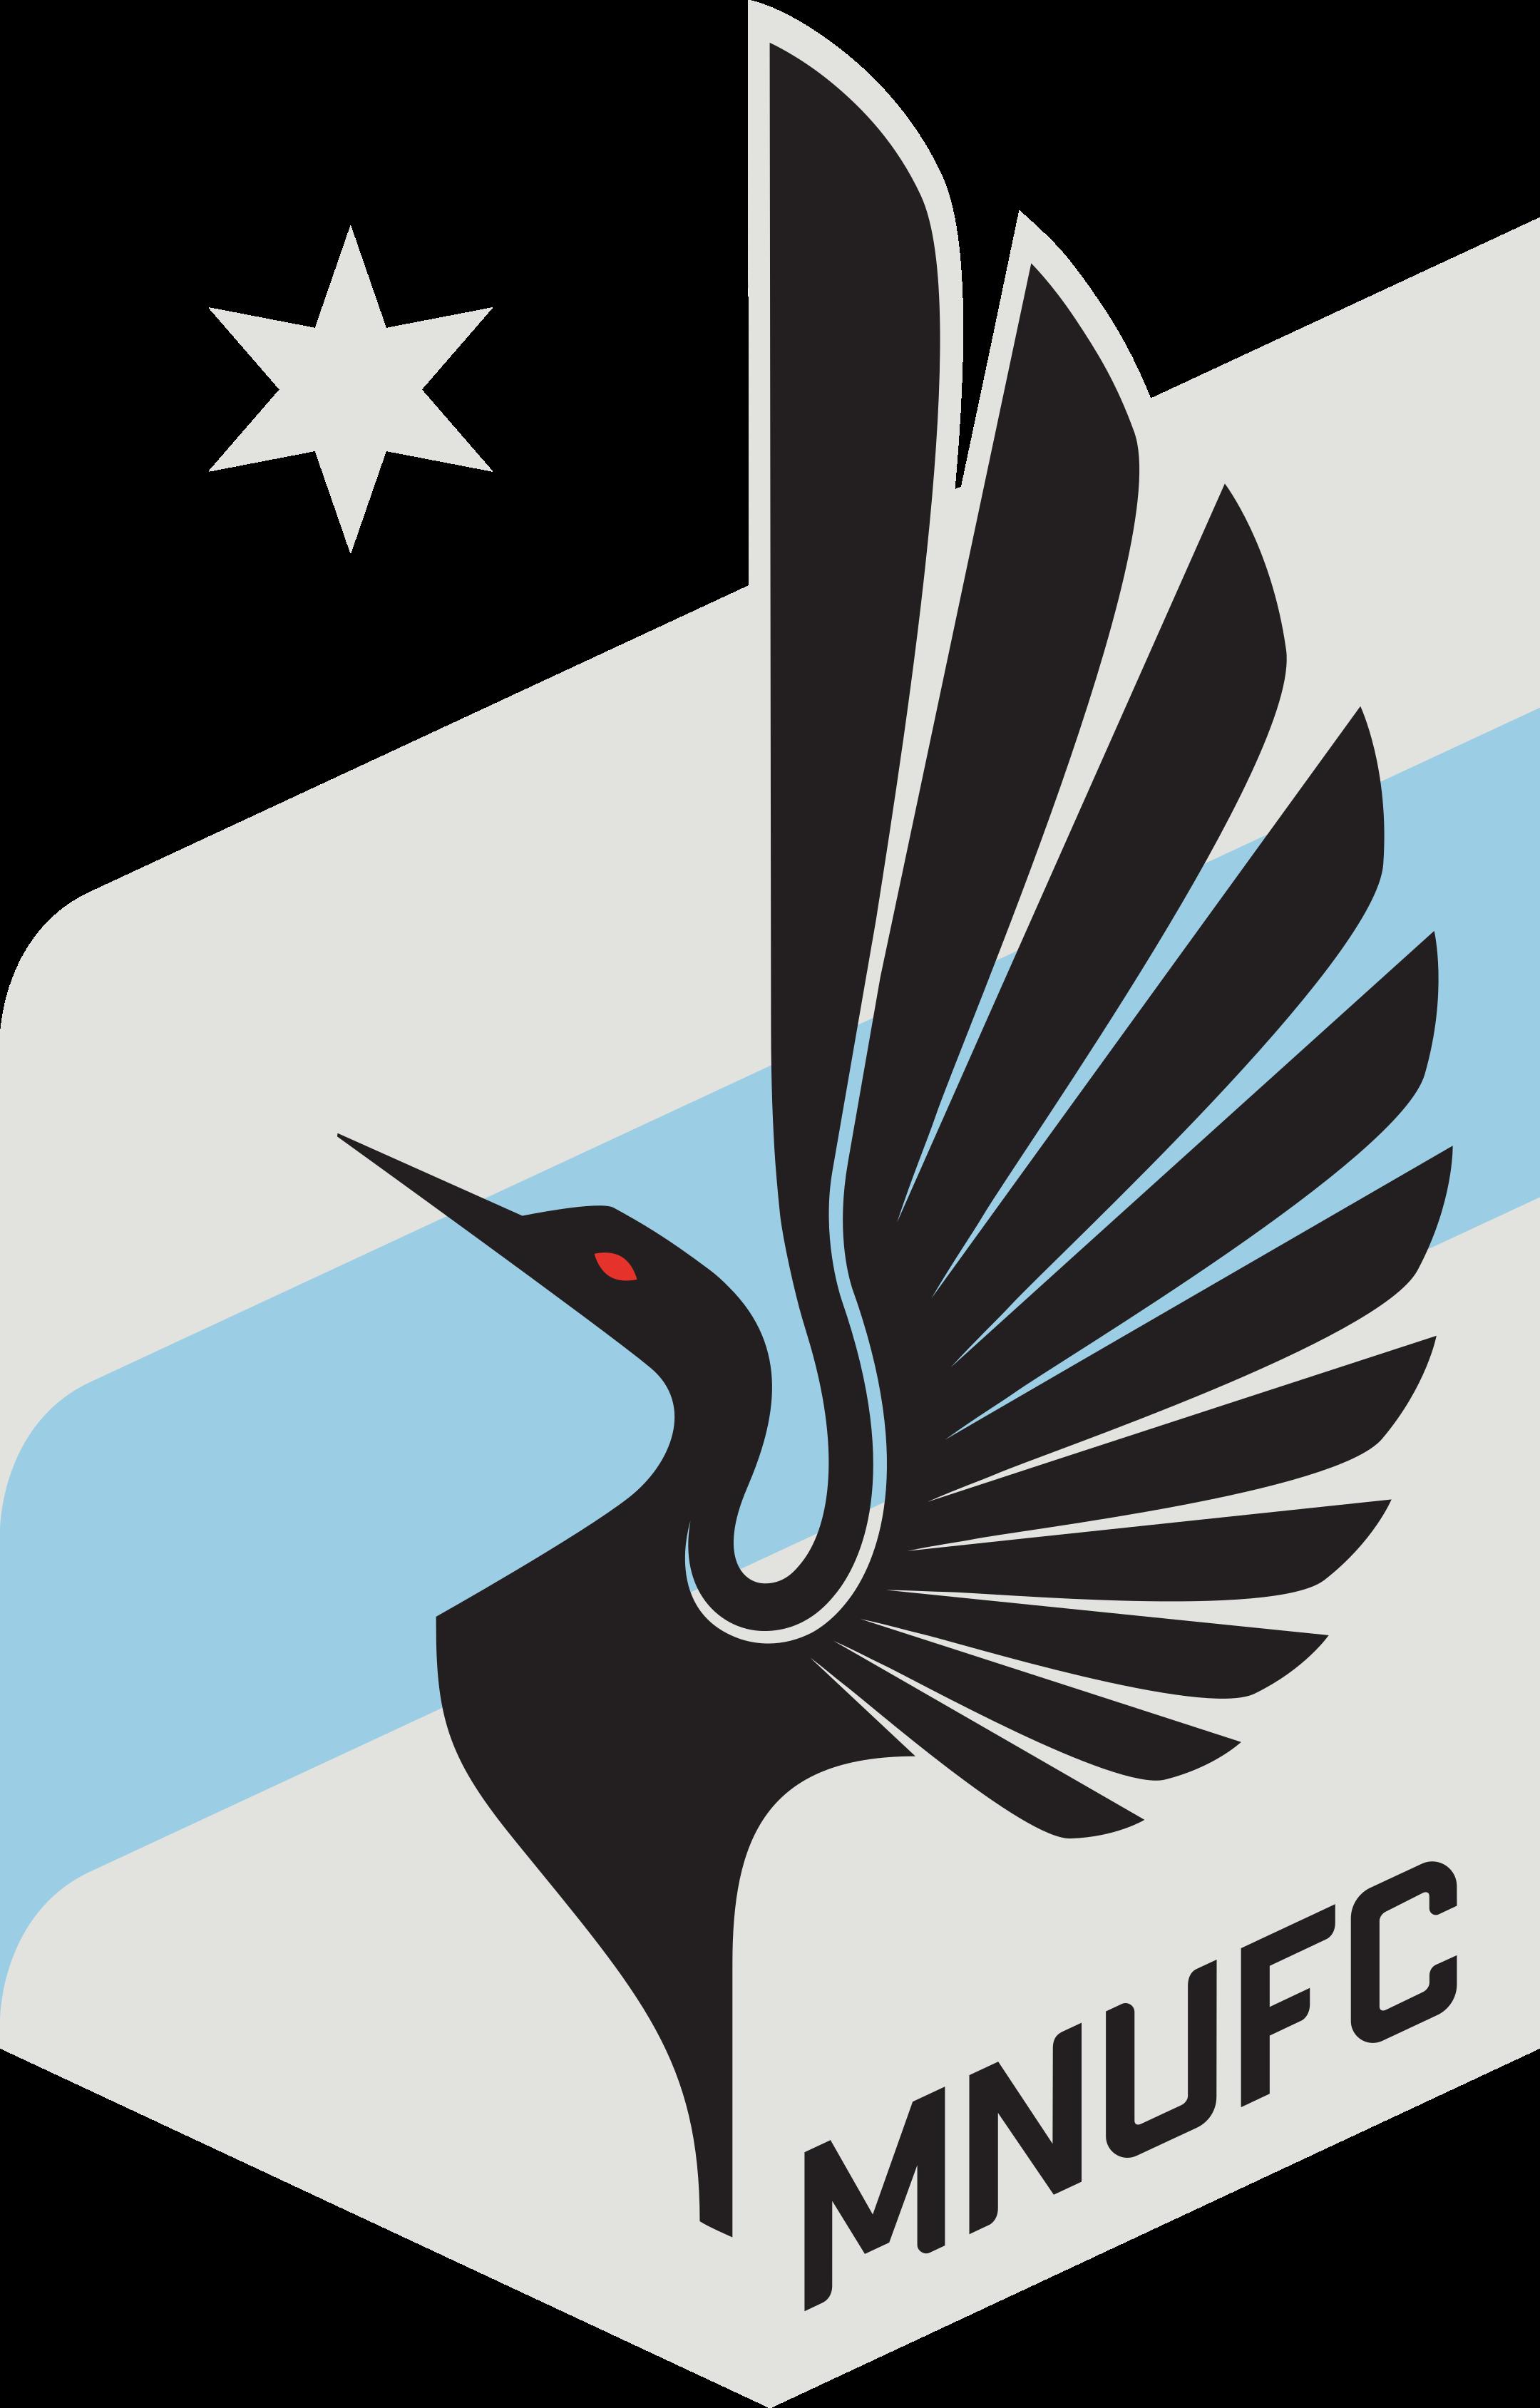 minnesota united fc logo 1 - Minnesota United FC Logo